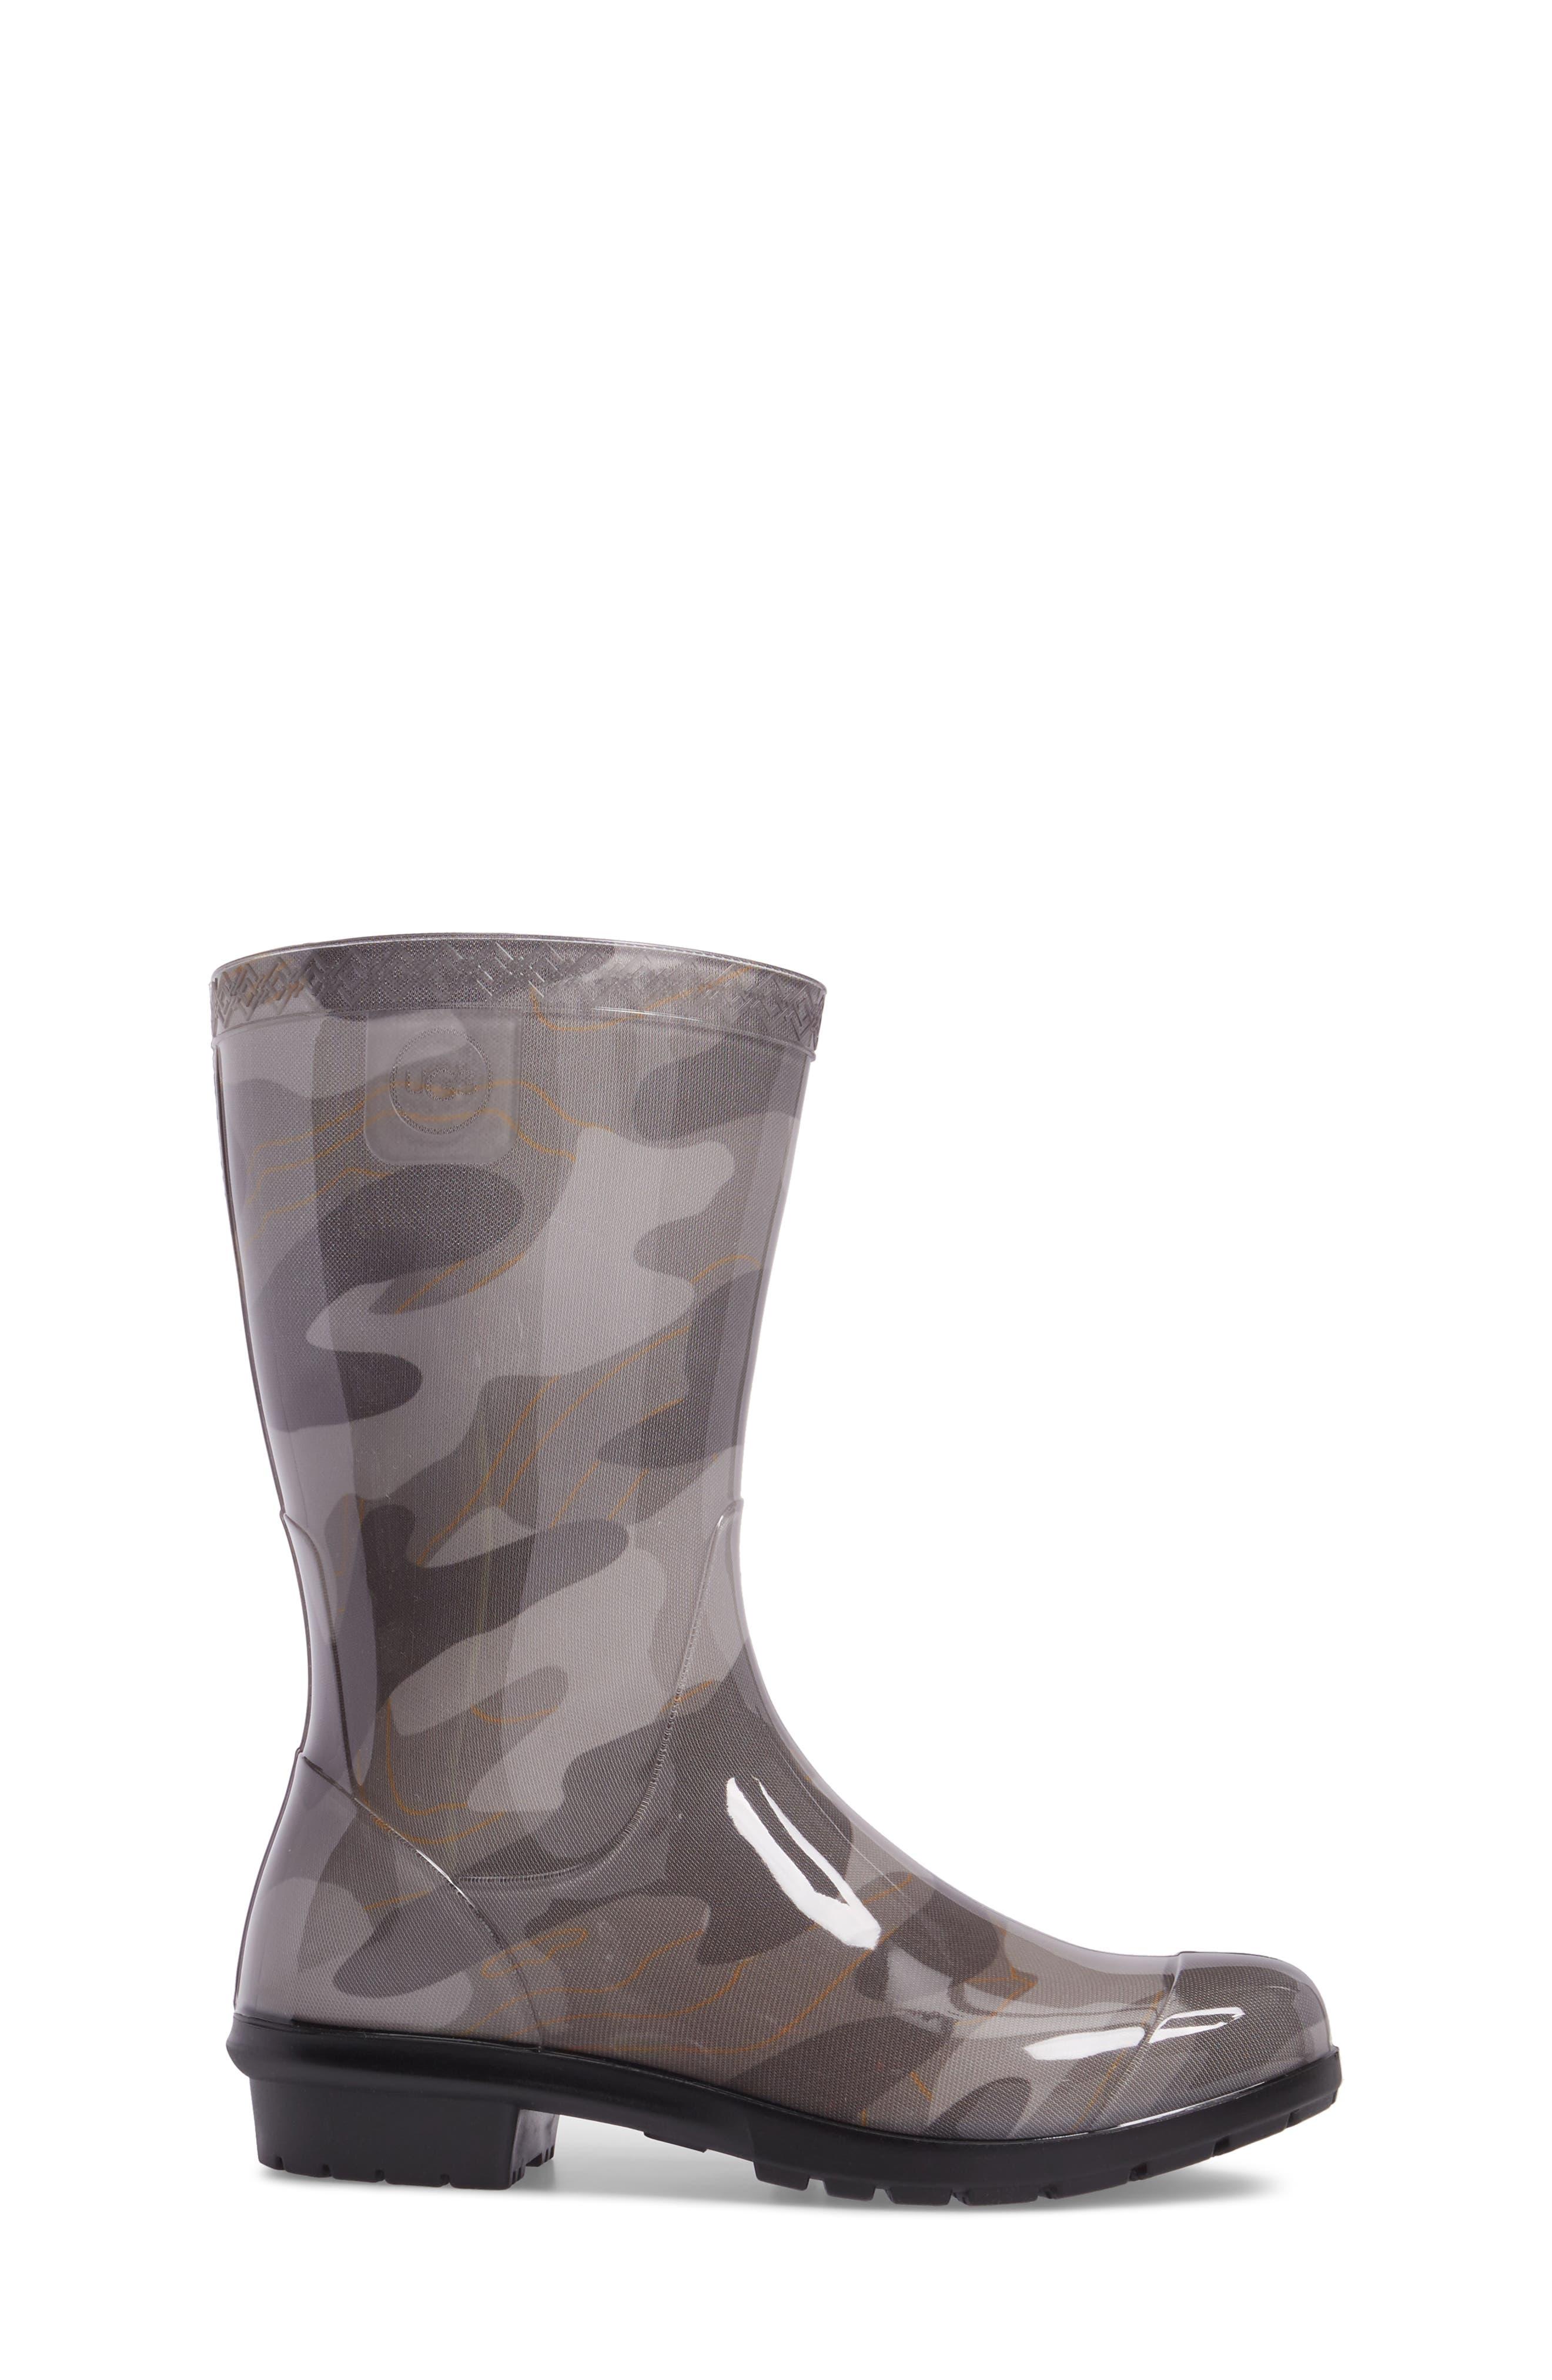 Rahjee Camo Waterproof Rain Boot,                             Alternate thumbnail 3, color,                             020